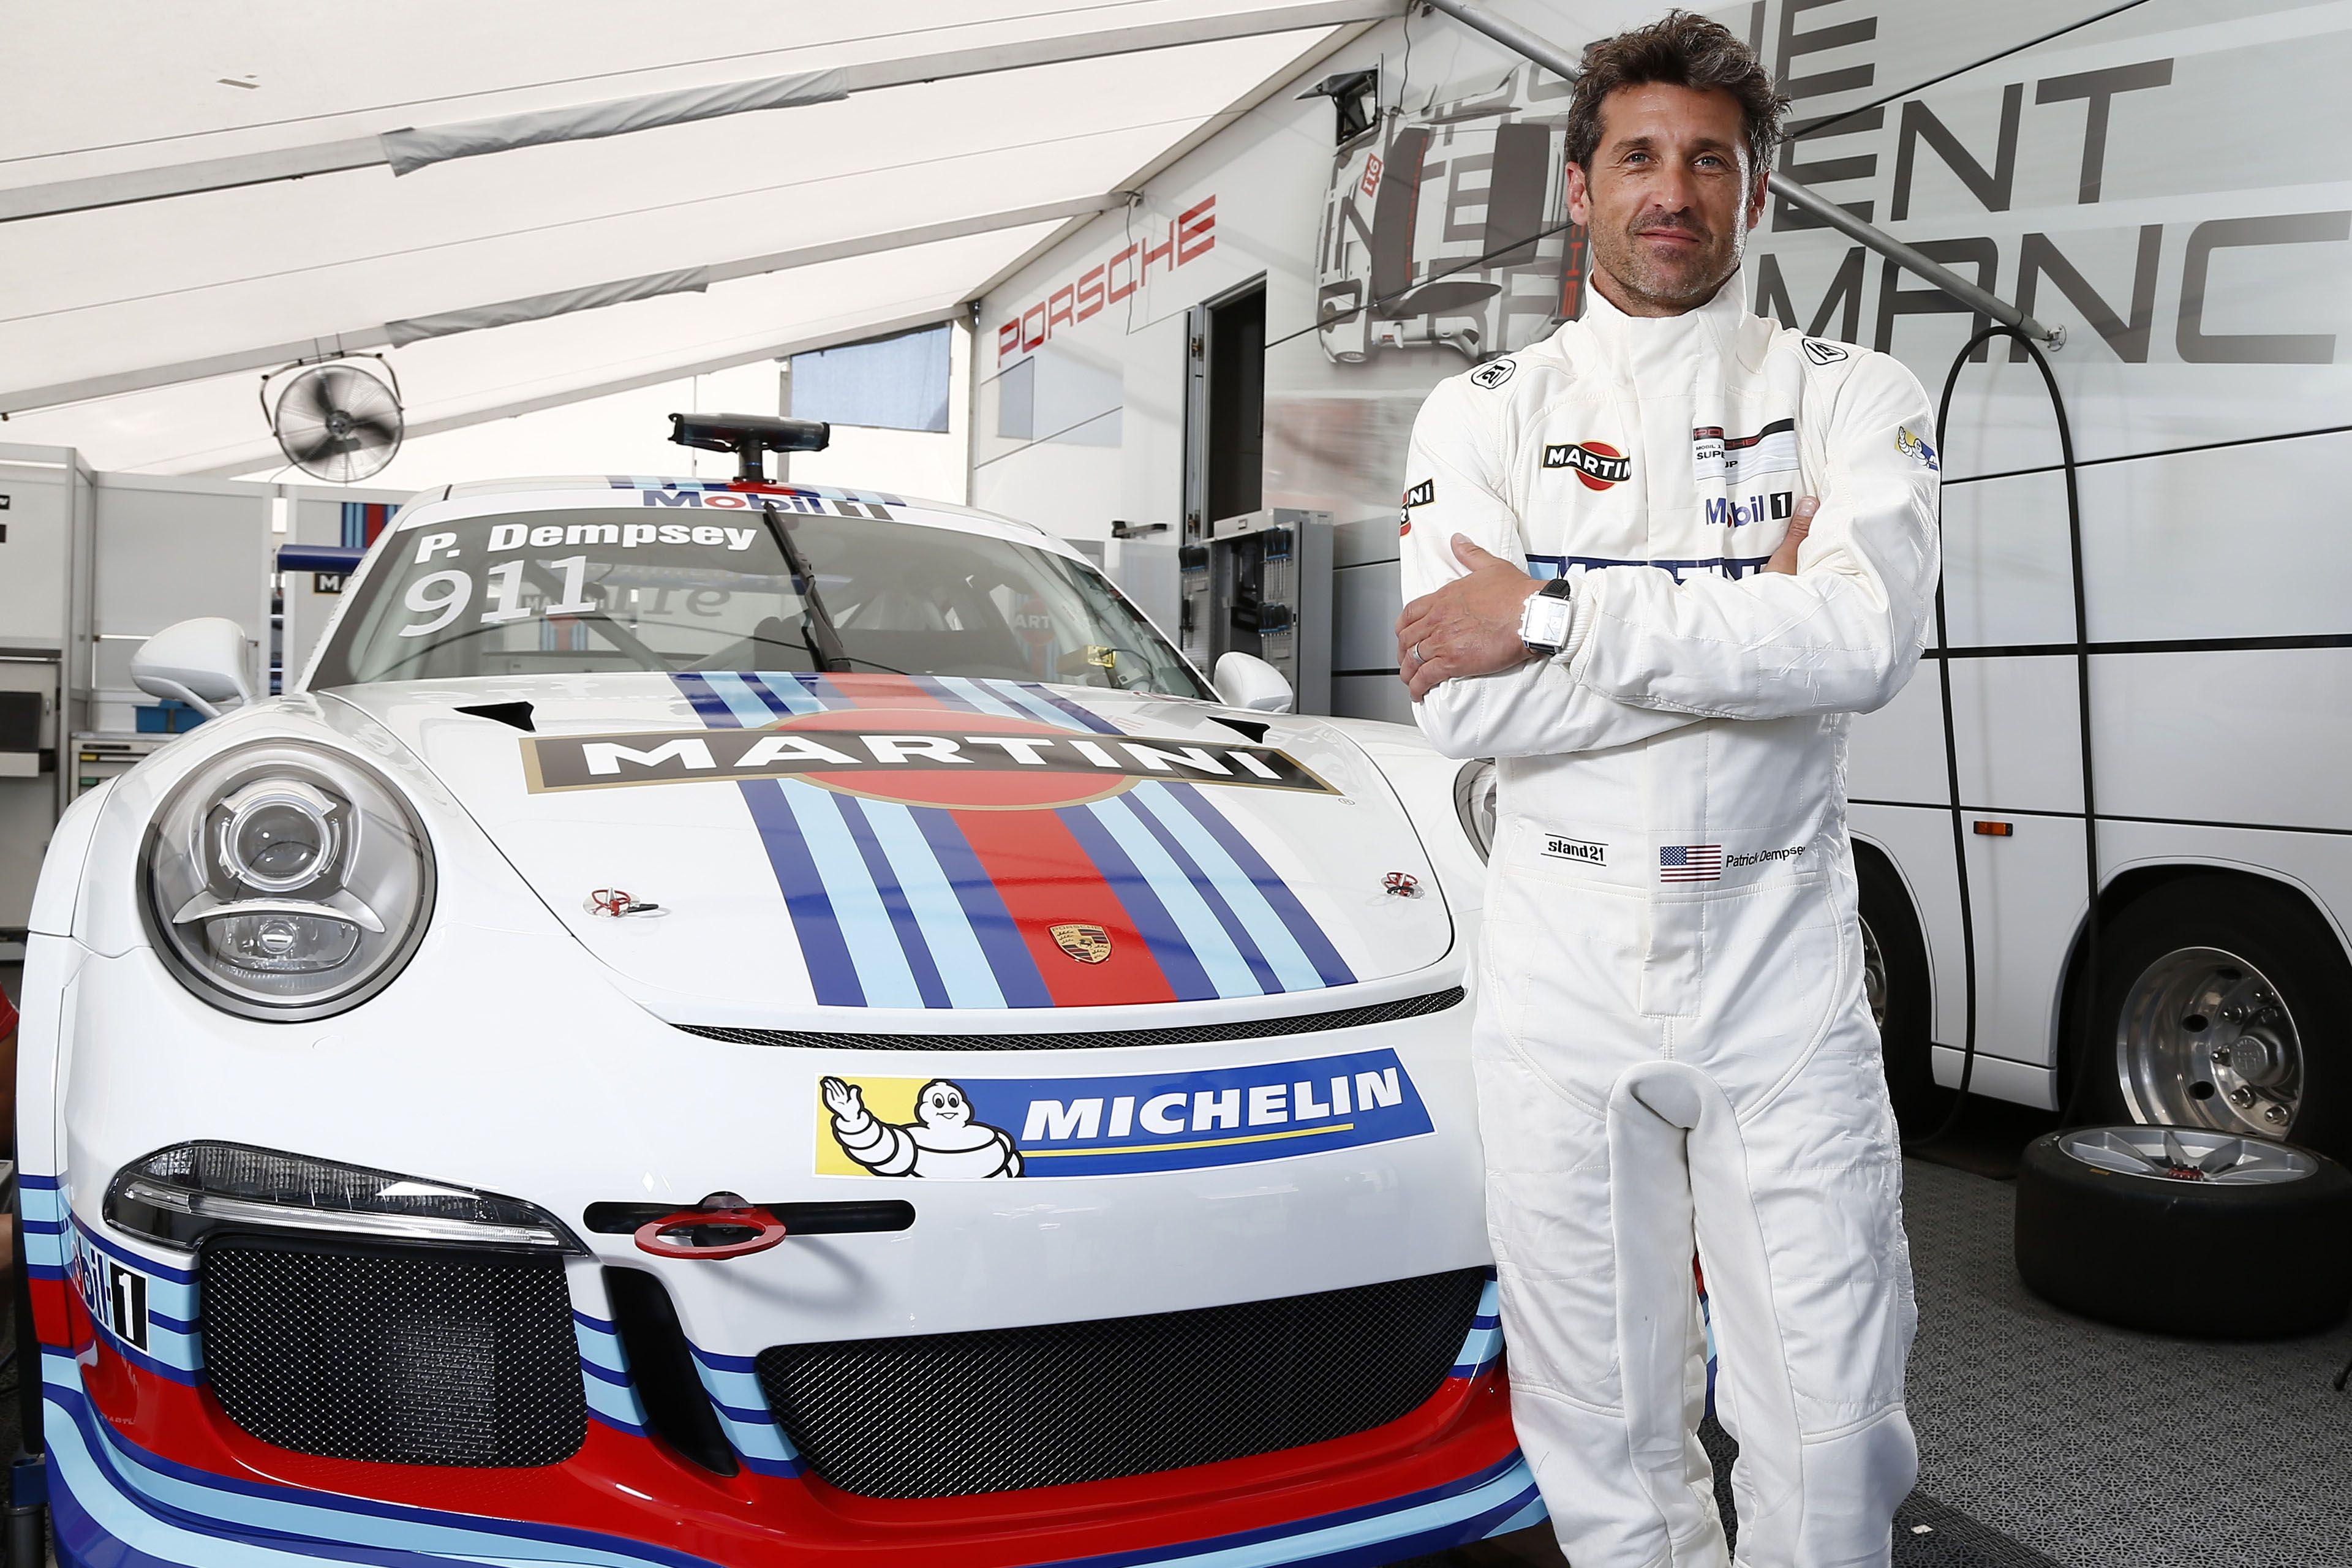 Patrick Dempsey Races For Martini In The Porsche Mobil 1 Supercup